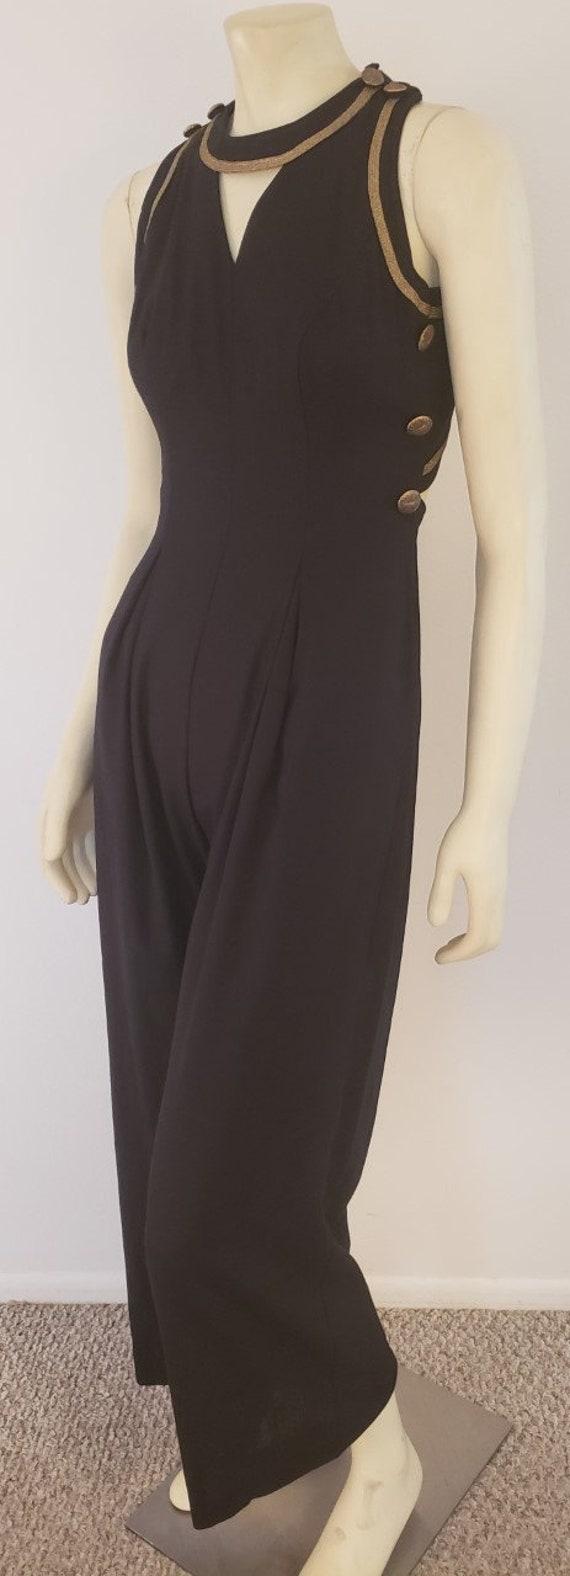 Cache black gold sleeveless jumpsuit S 1990's